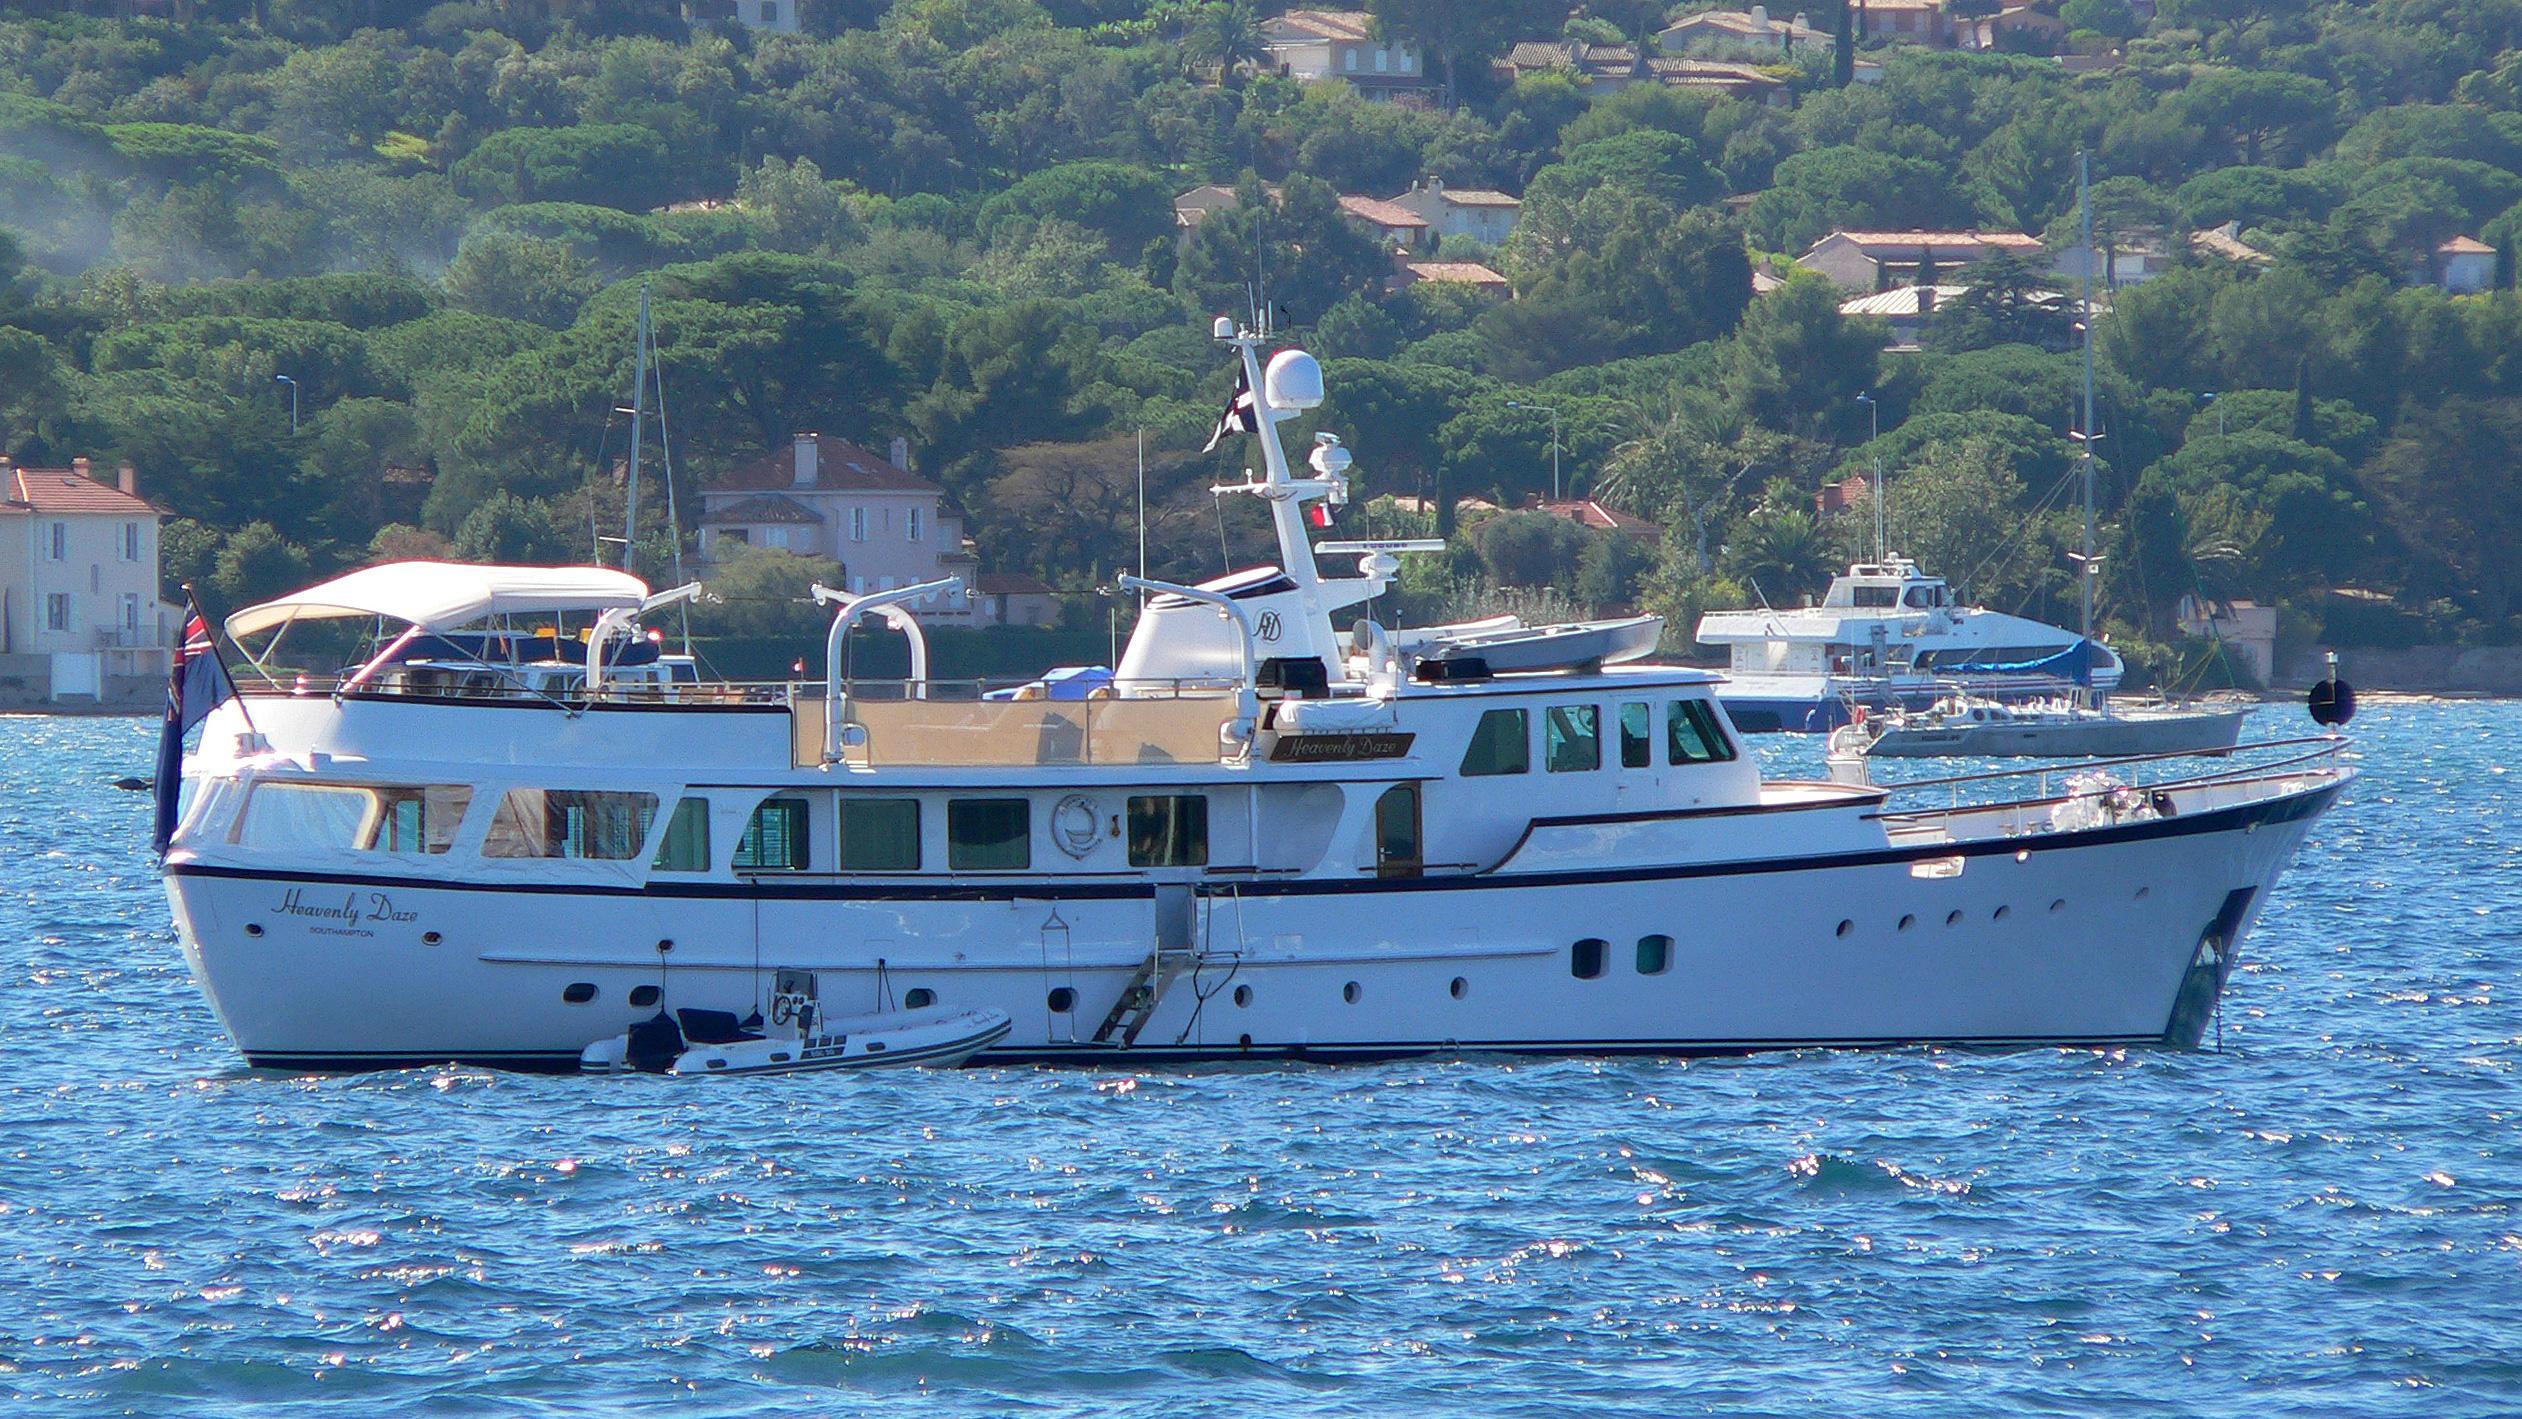 heavenly-daze-motor-yacht-feadship-1972-32m-profile-moored